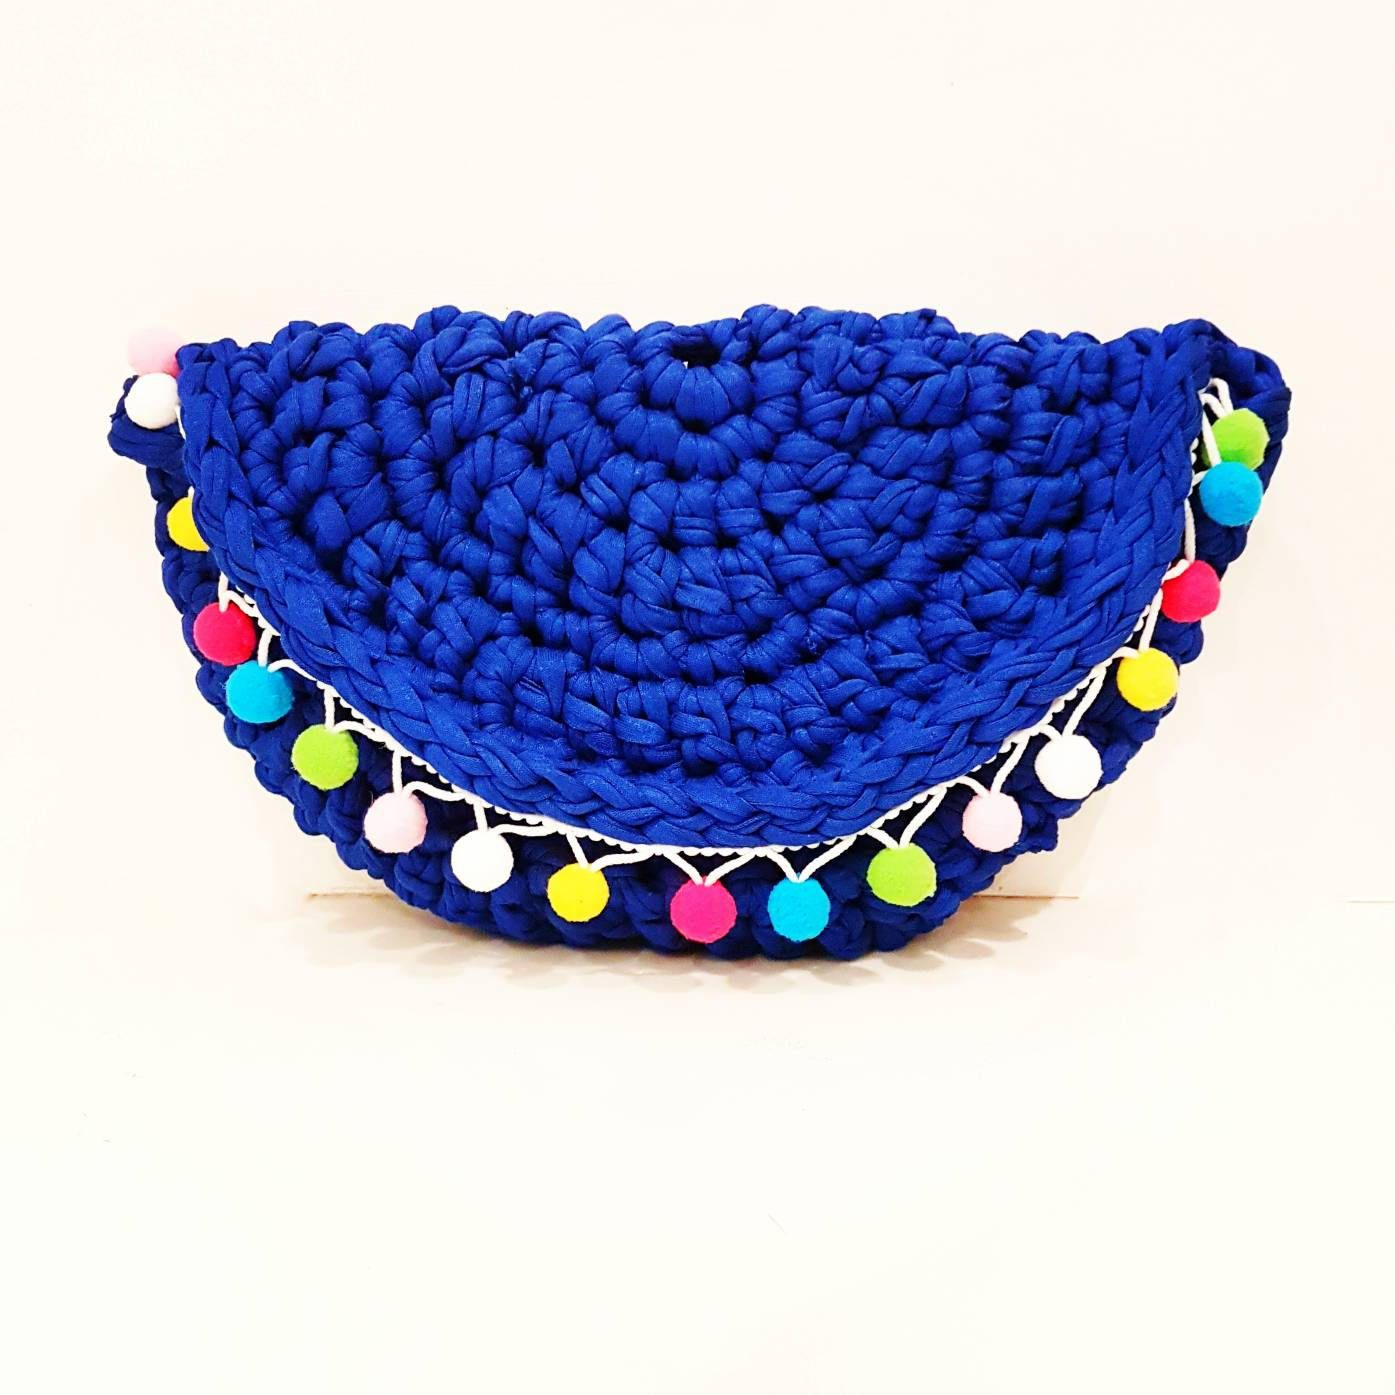 Make E seamless moon bag crochet pattern UK pdf download